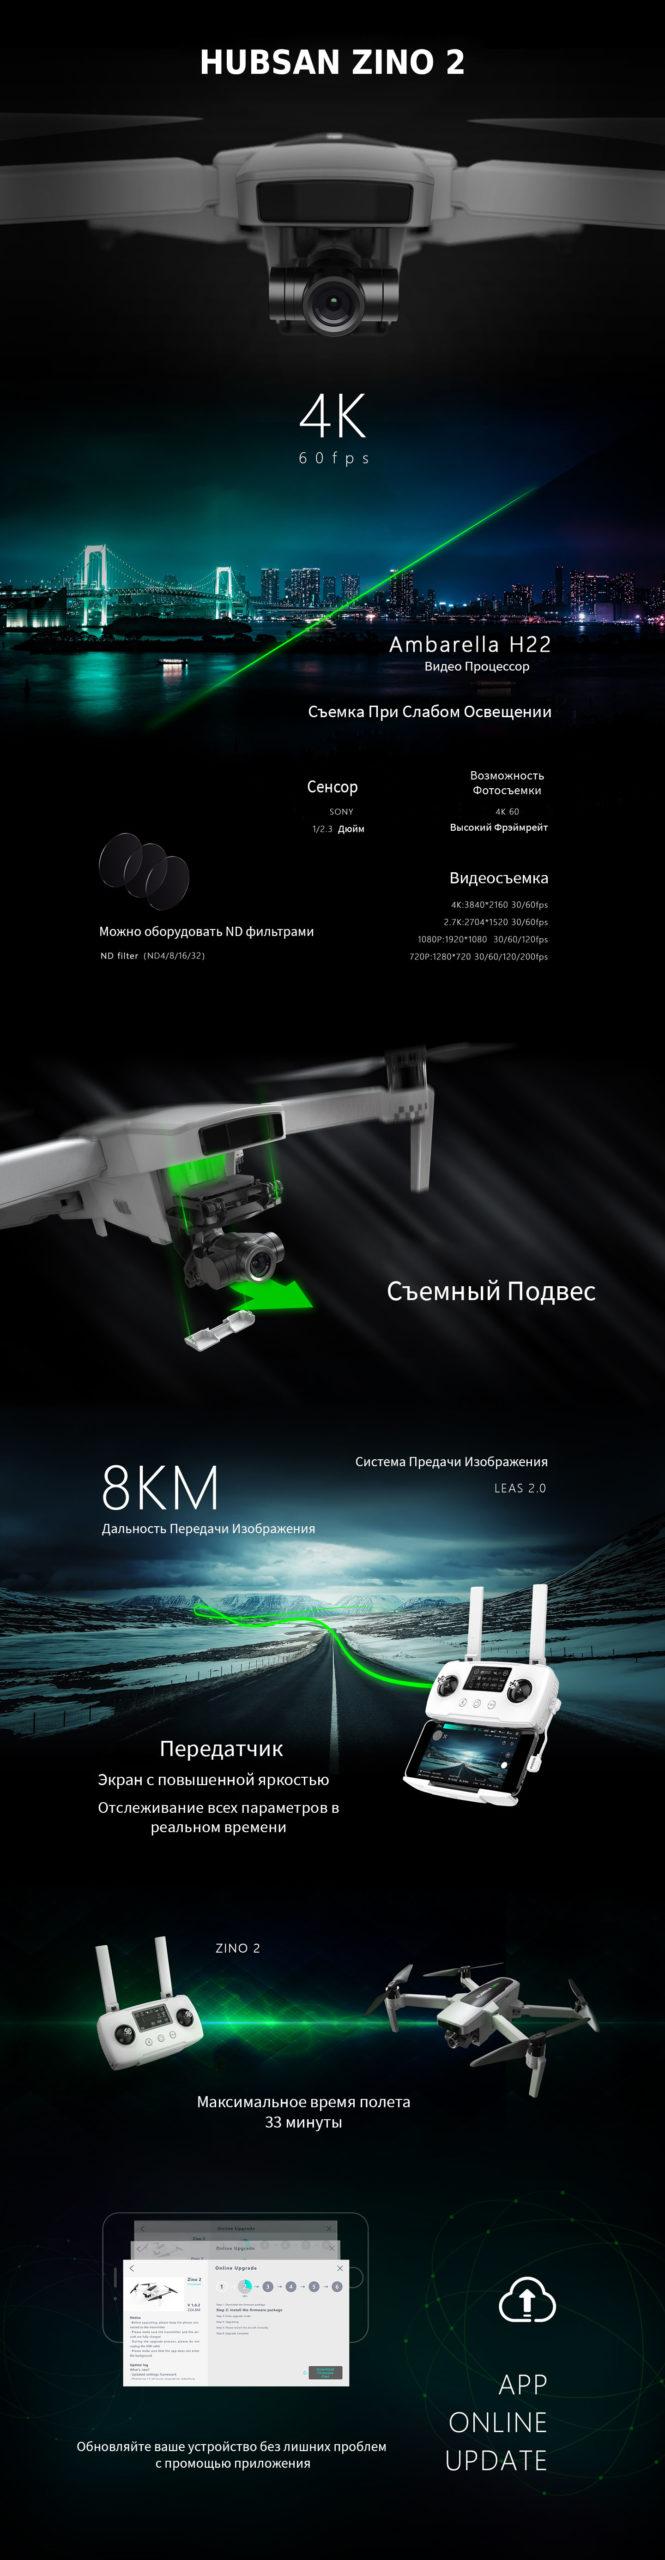 Квадрокоптер Hubsan Zino 2